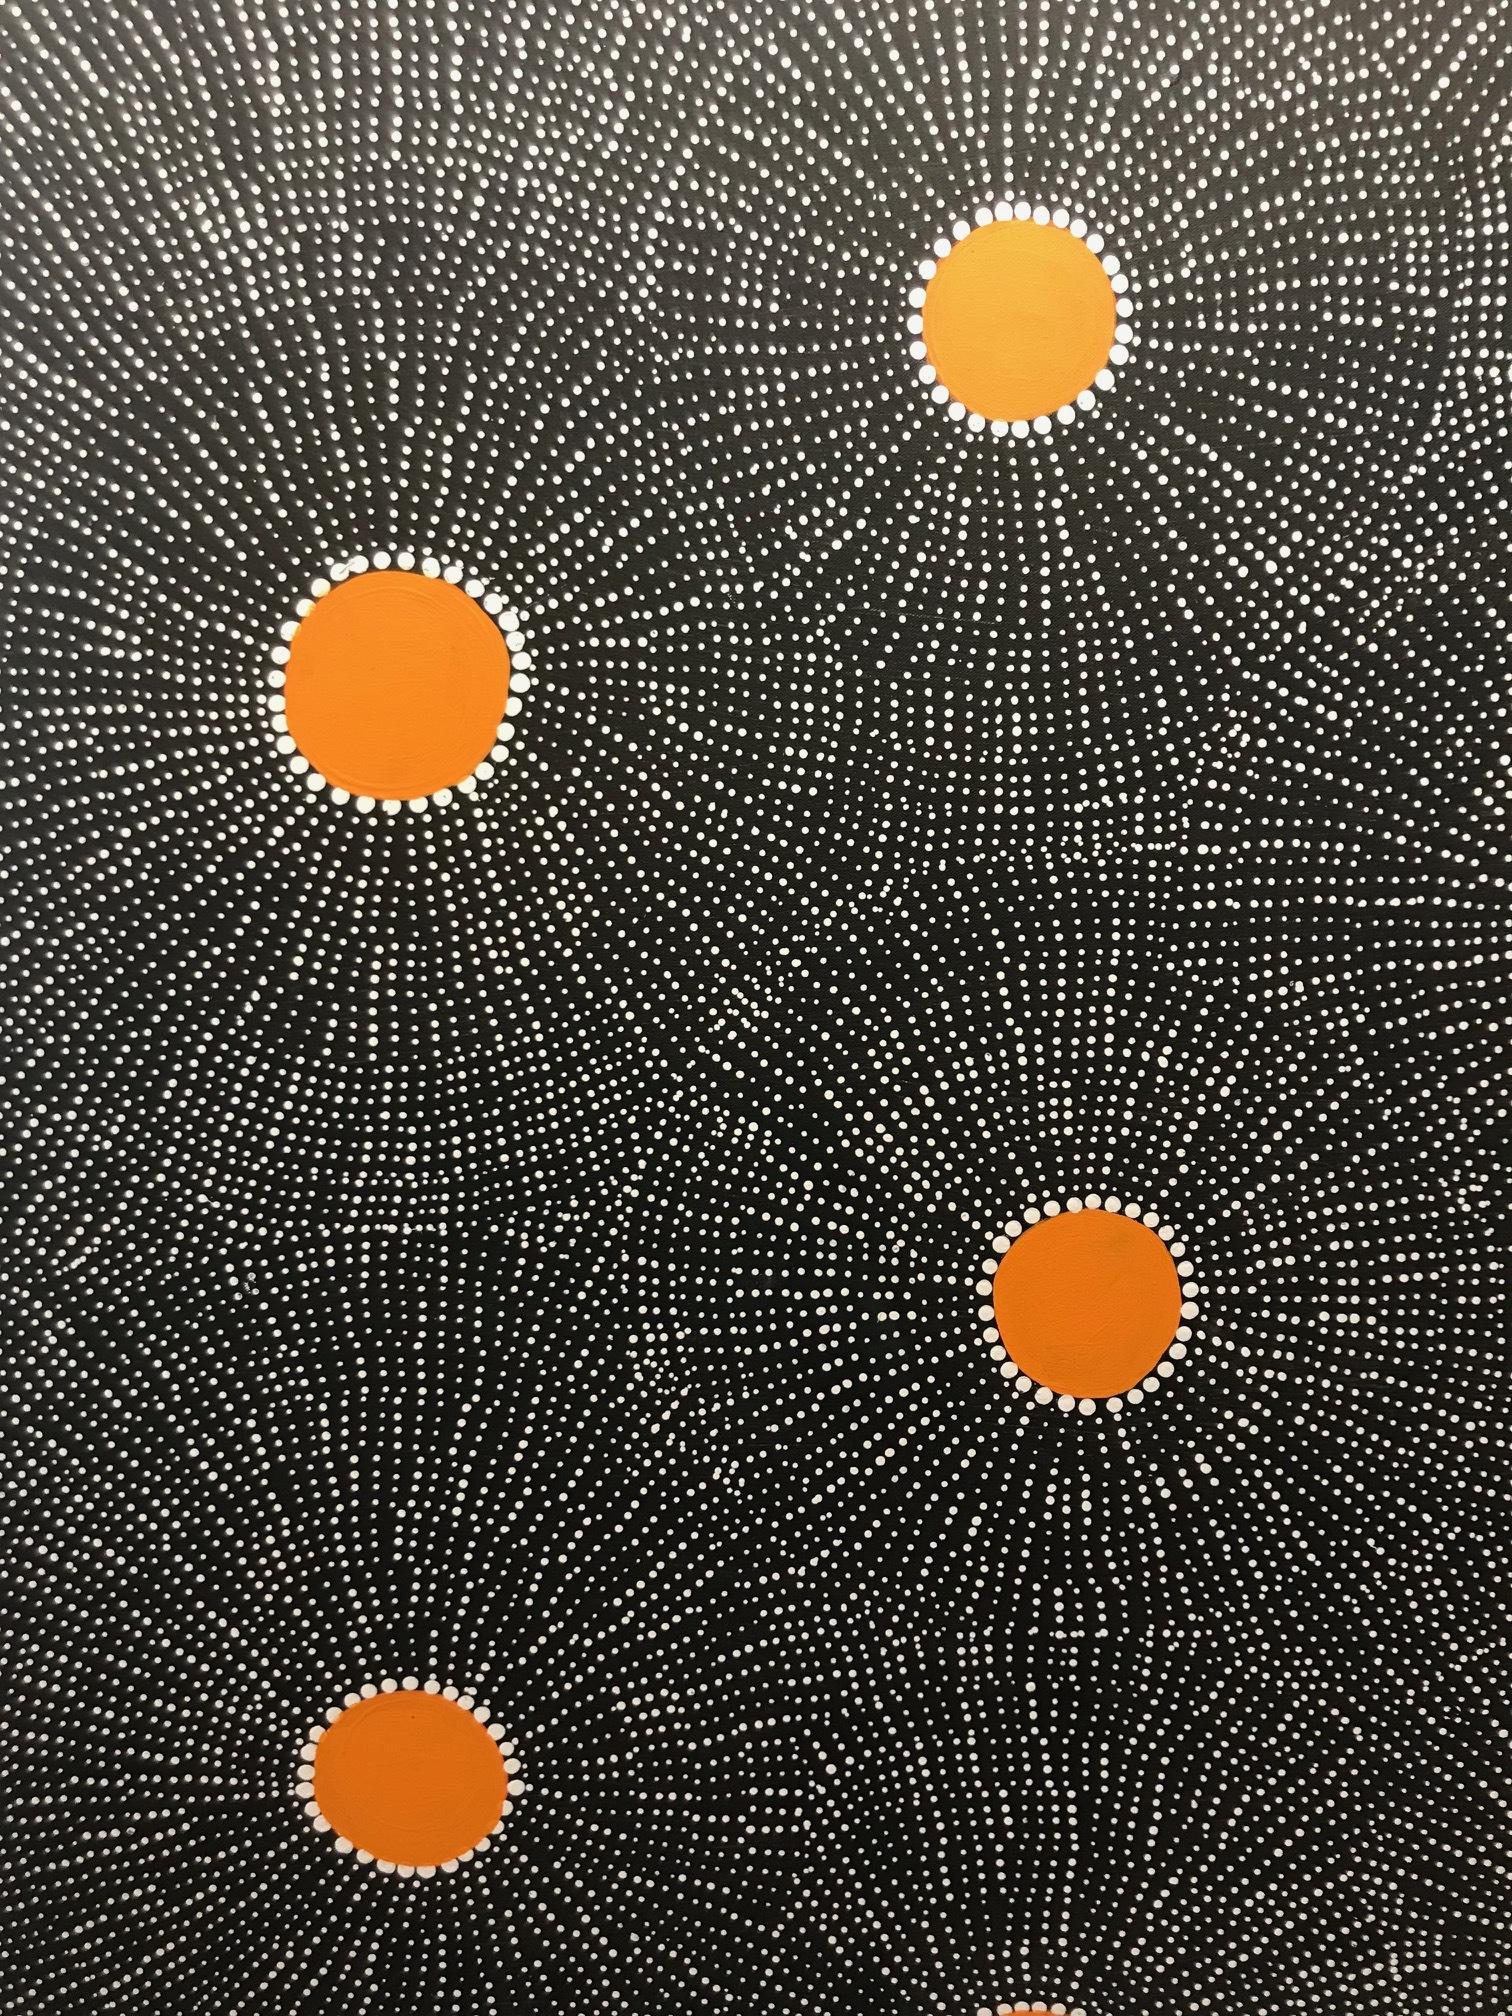 Marshall Jangala Robertson,   Watiya-warnu  Seed Dreaming